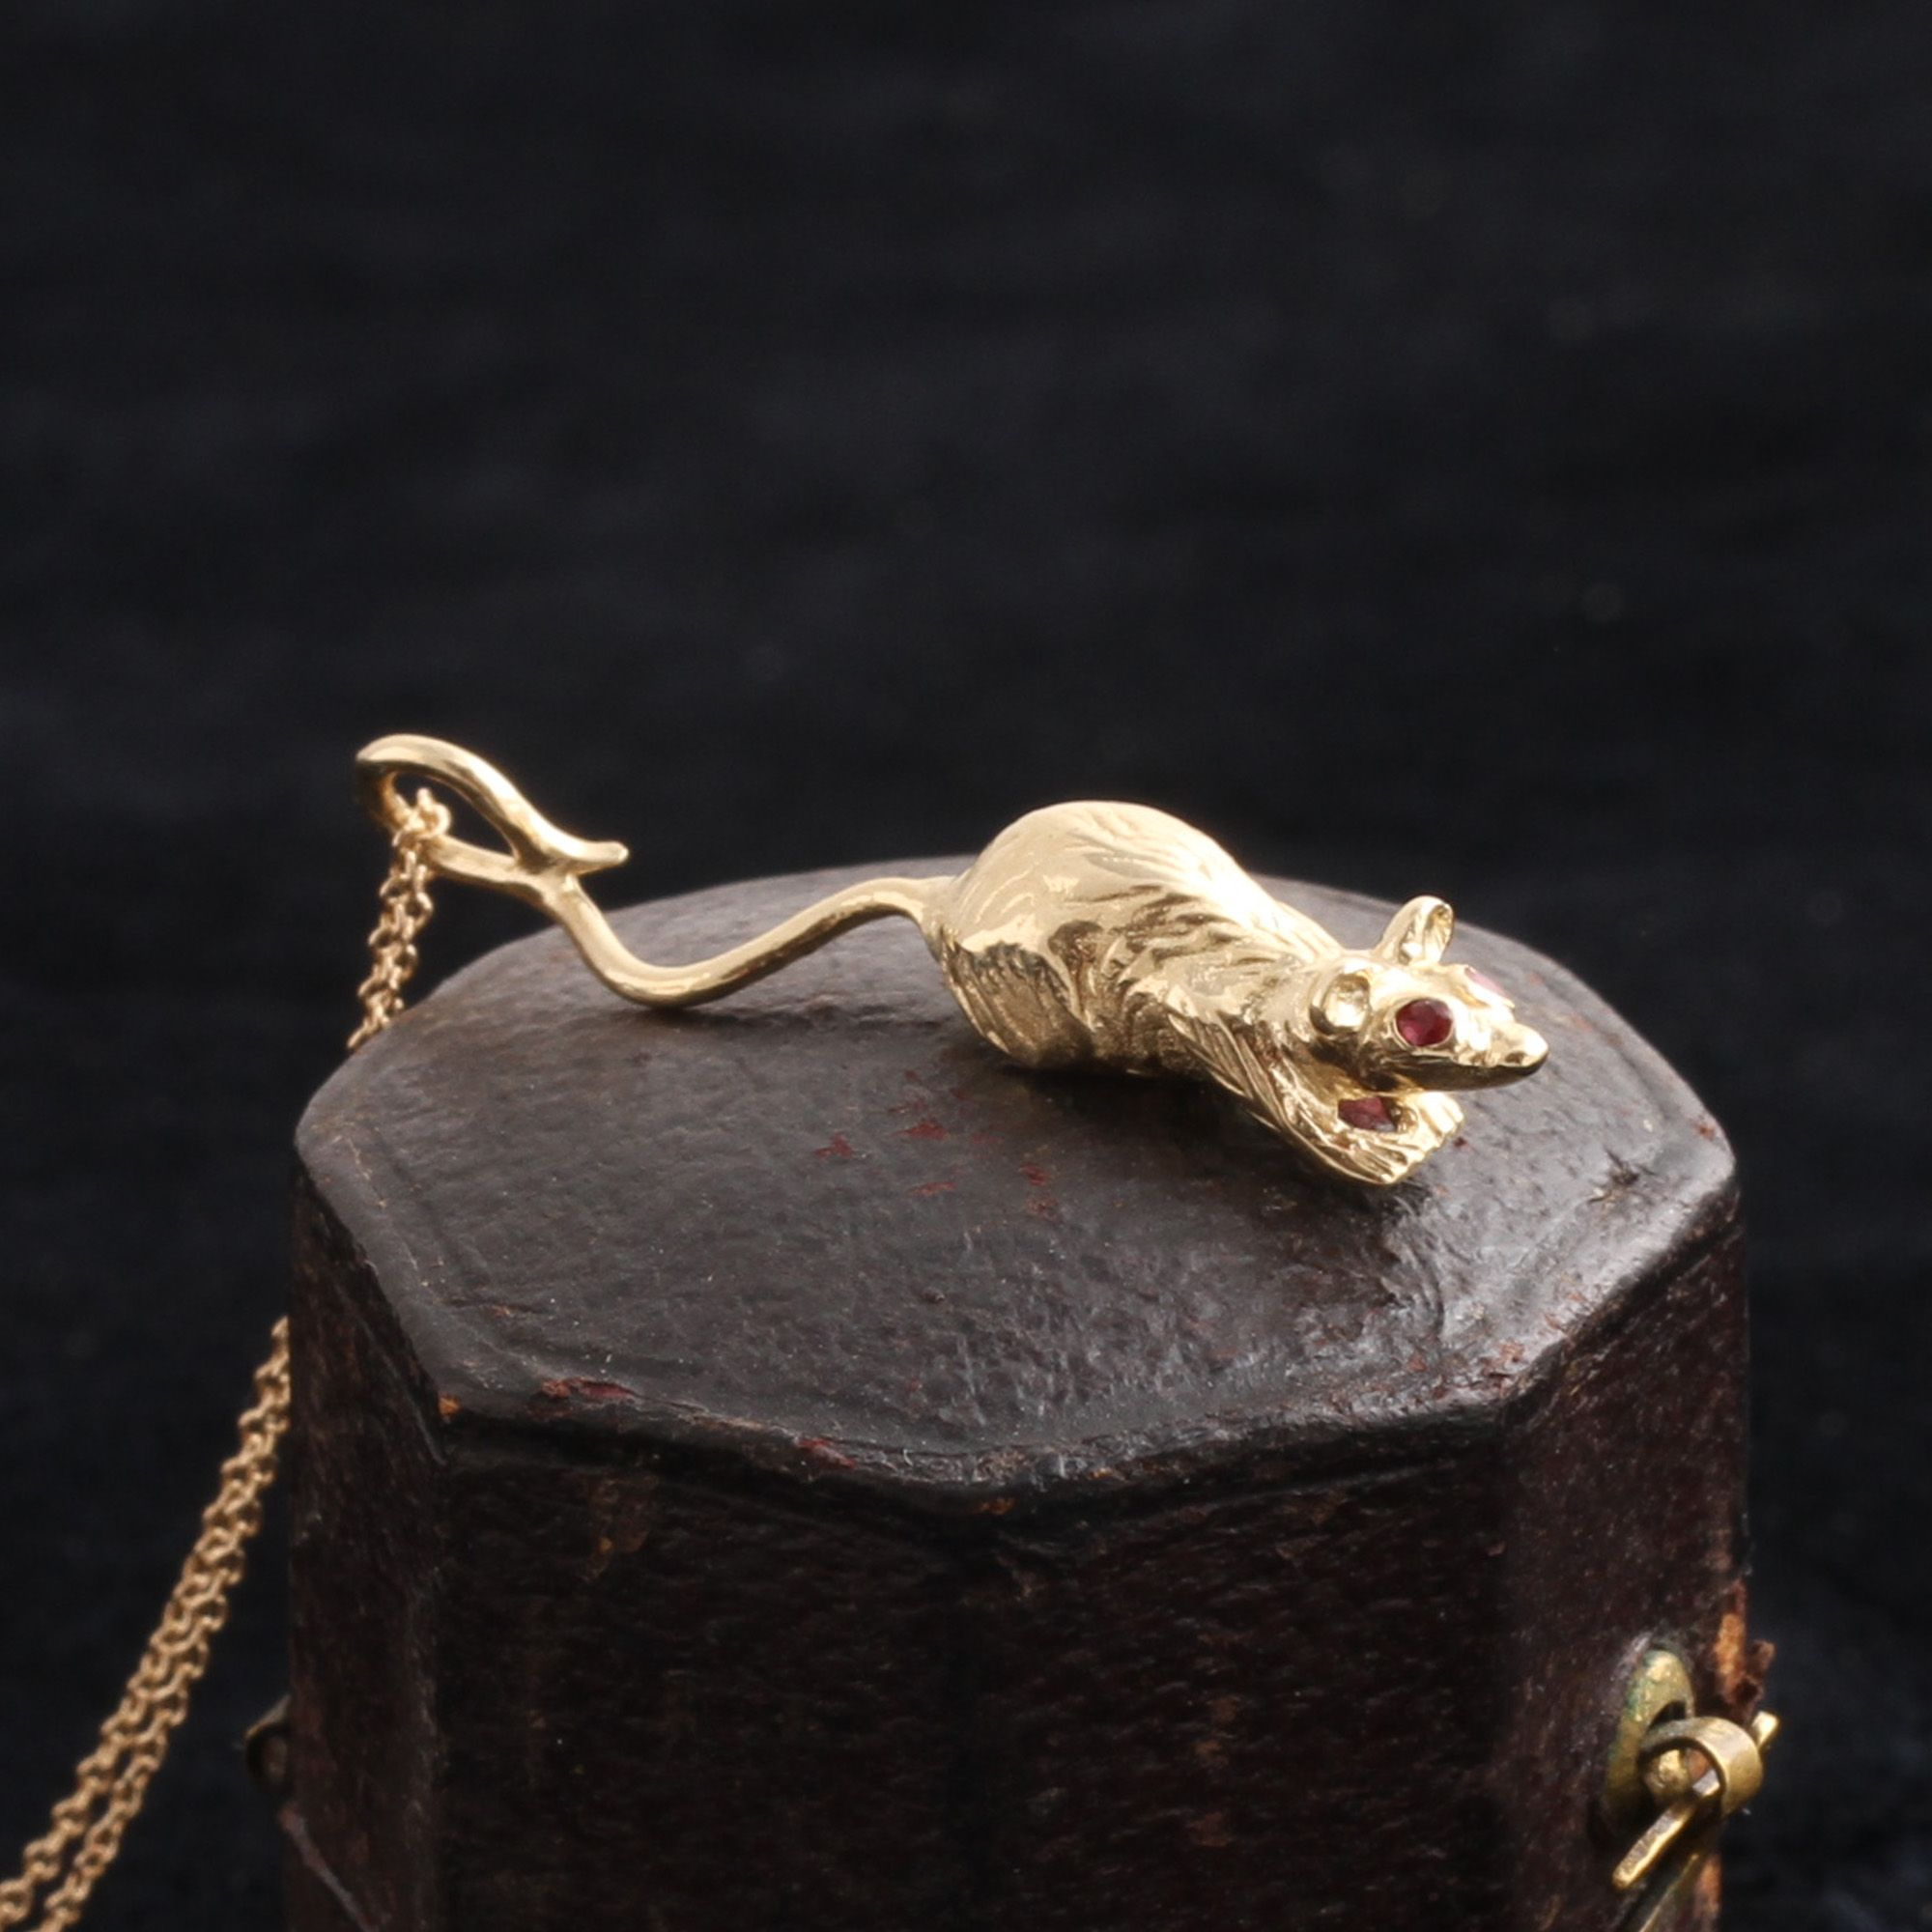 Ruby-Eyed Rat Necklace